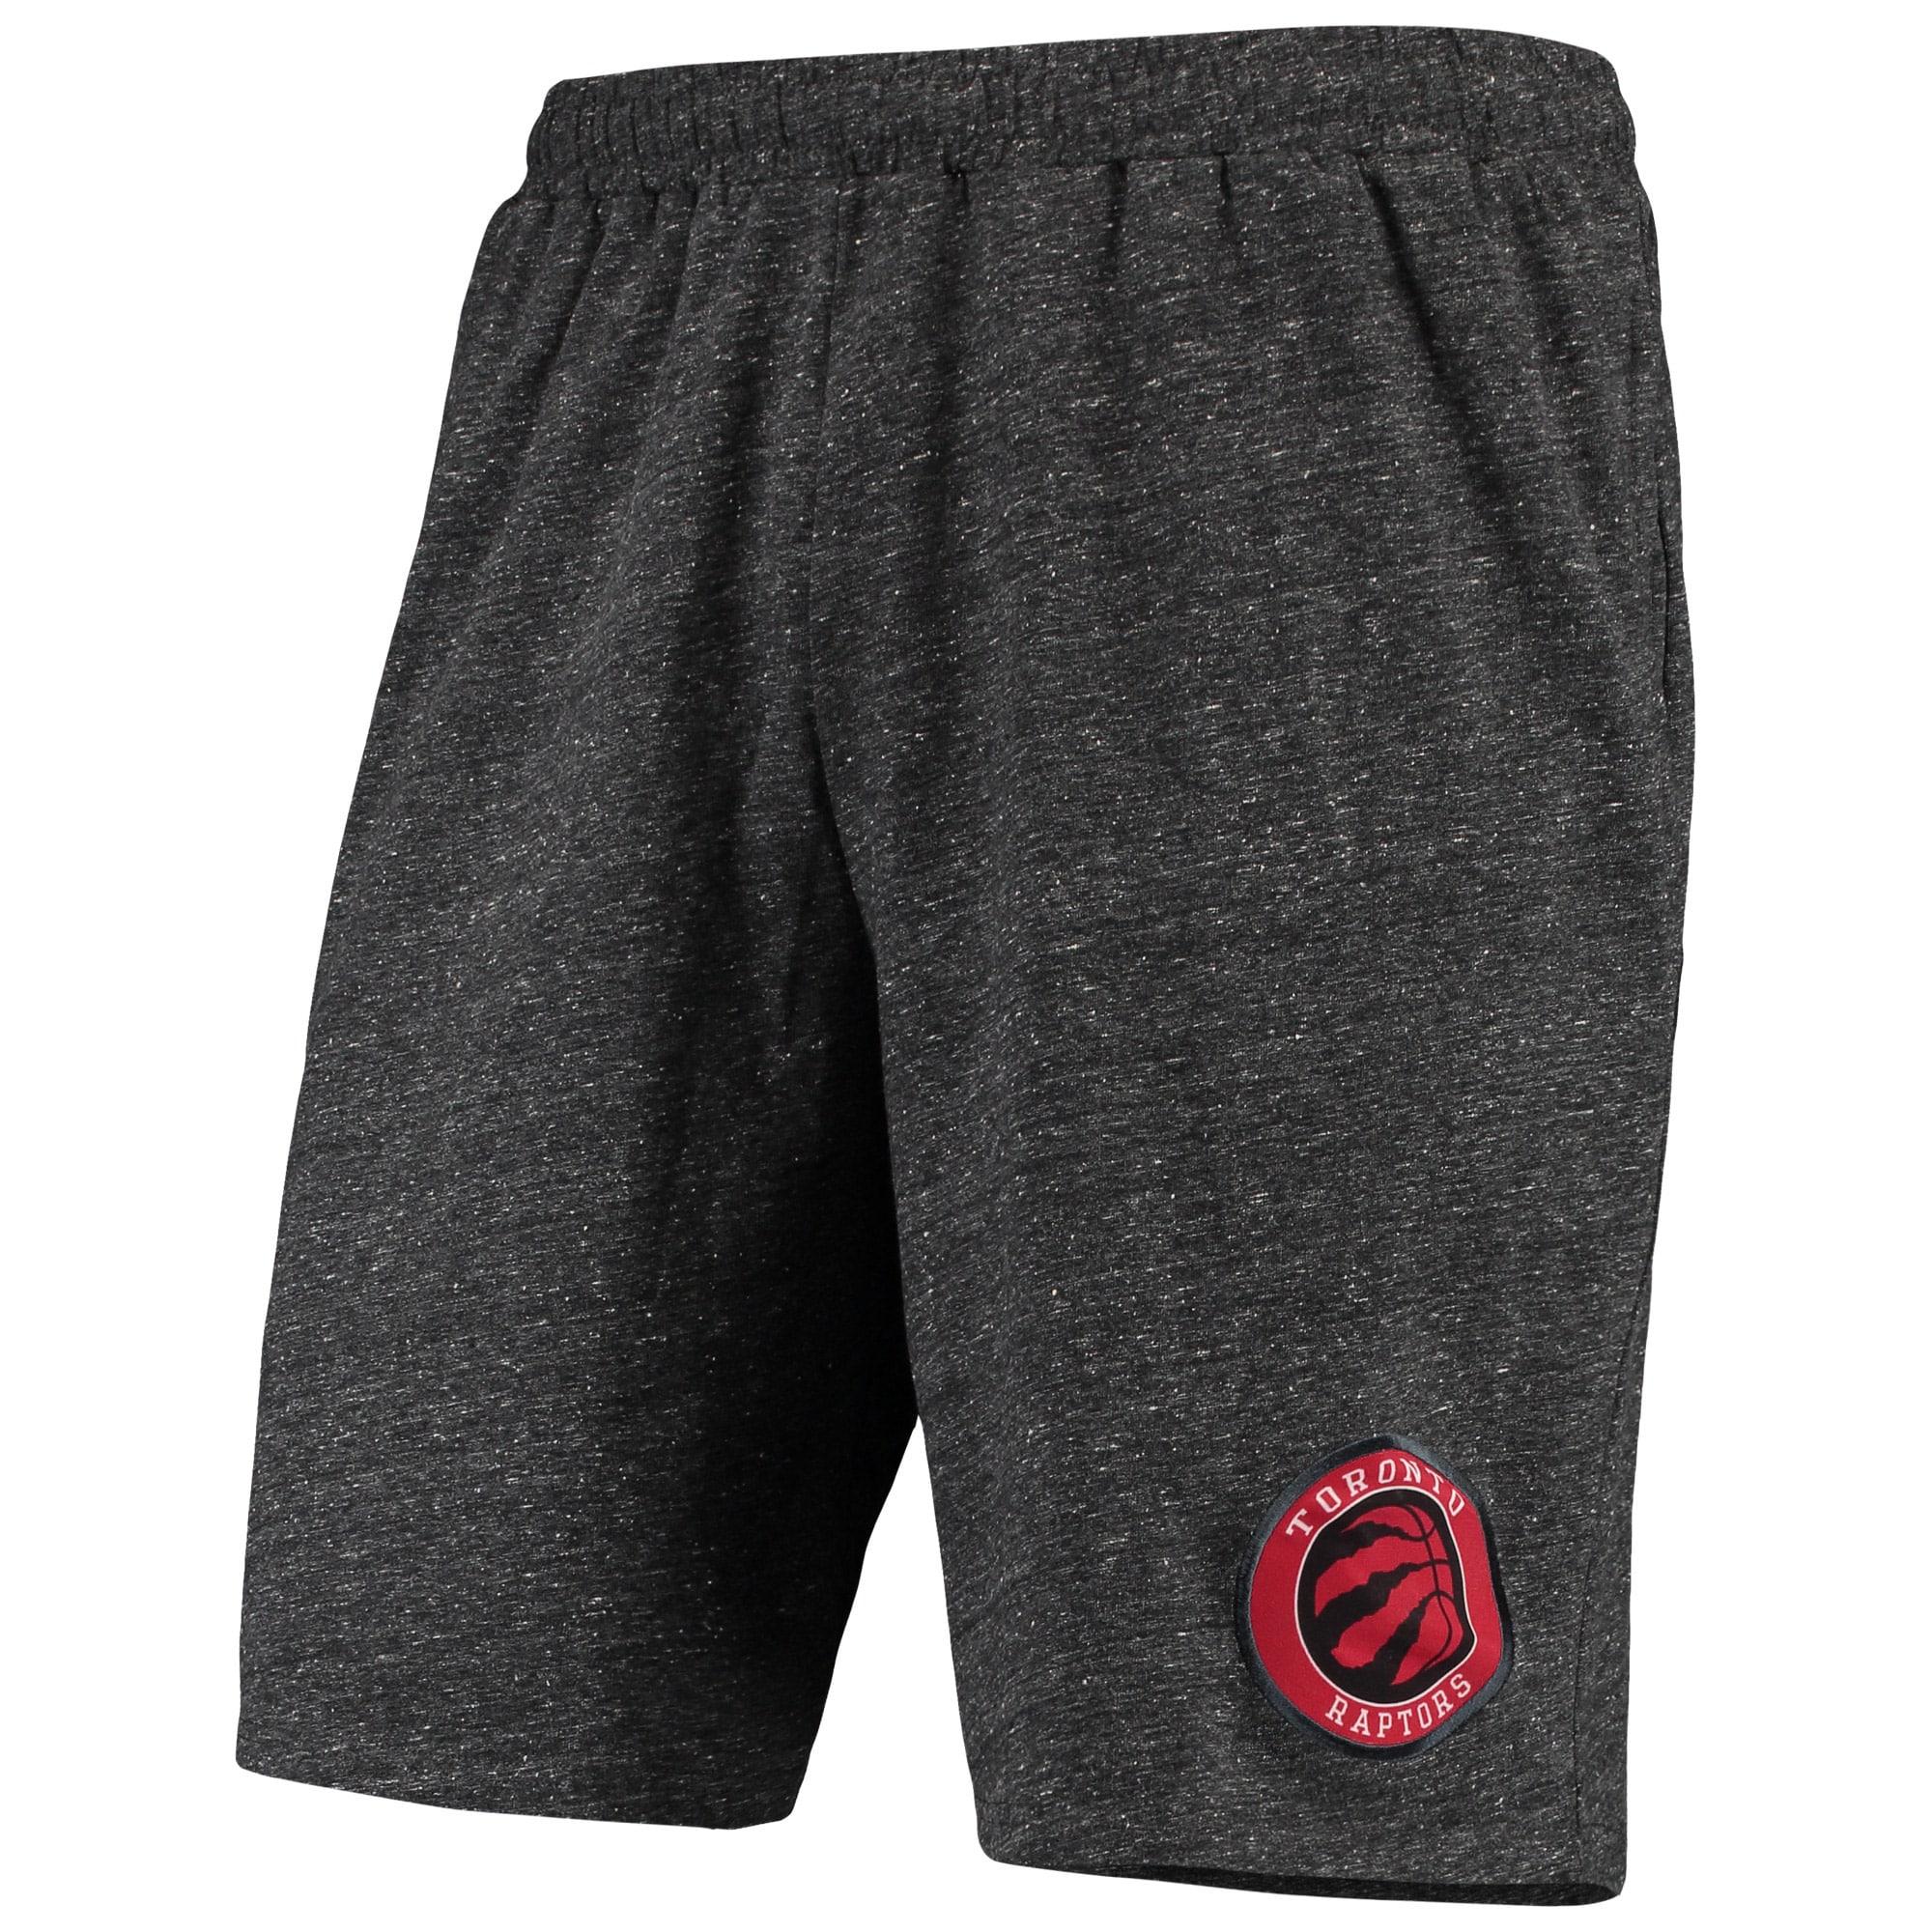 Toronto Raptors Concepts Sport Pitch Knit Jam Shorts - Charcoal